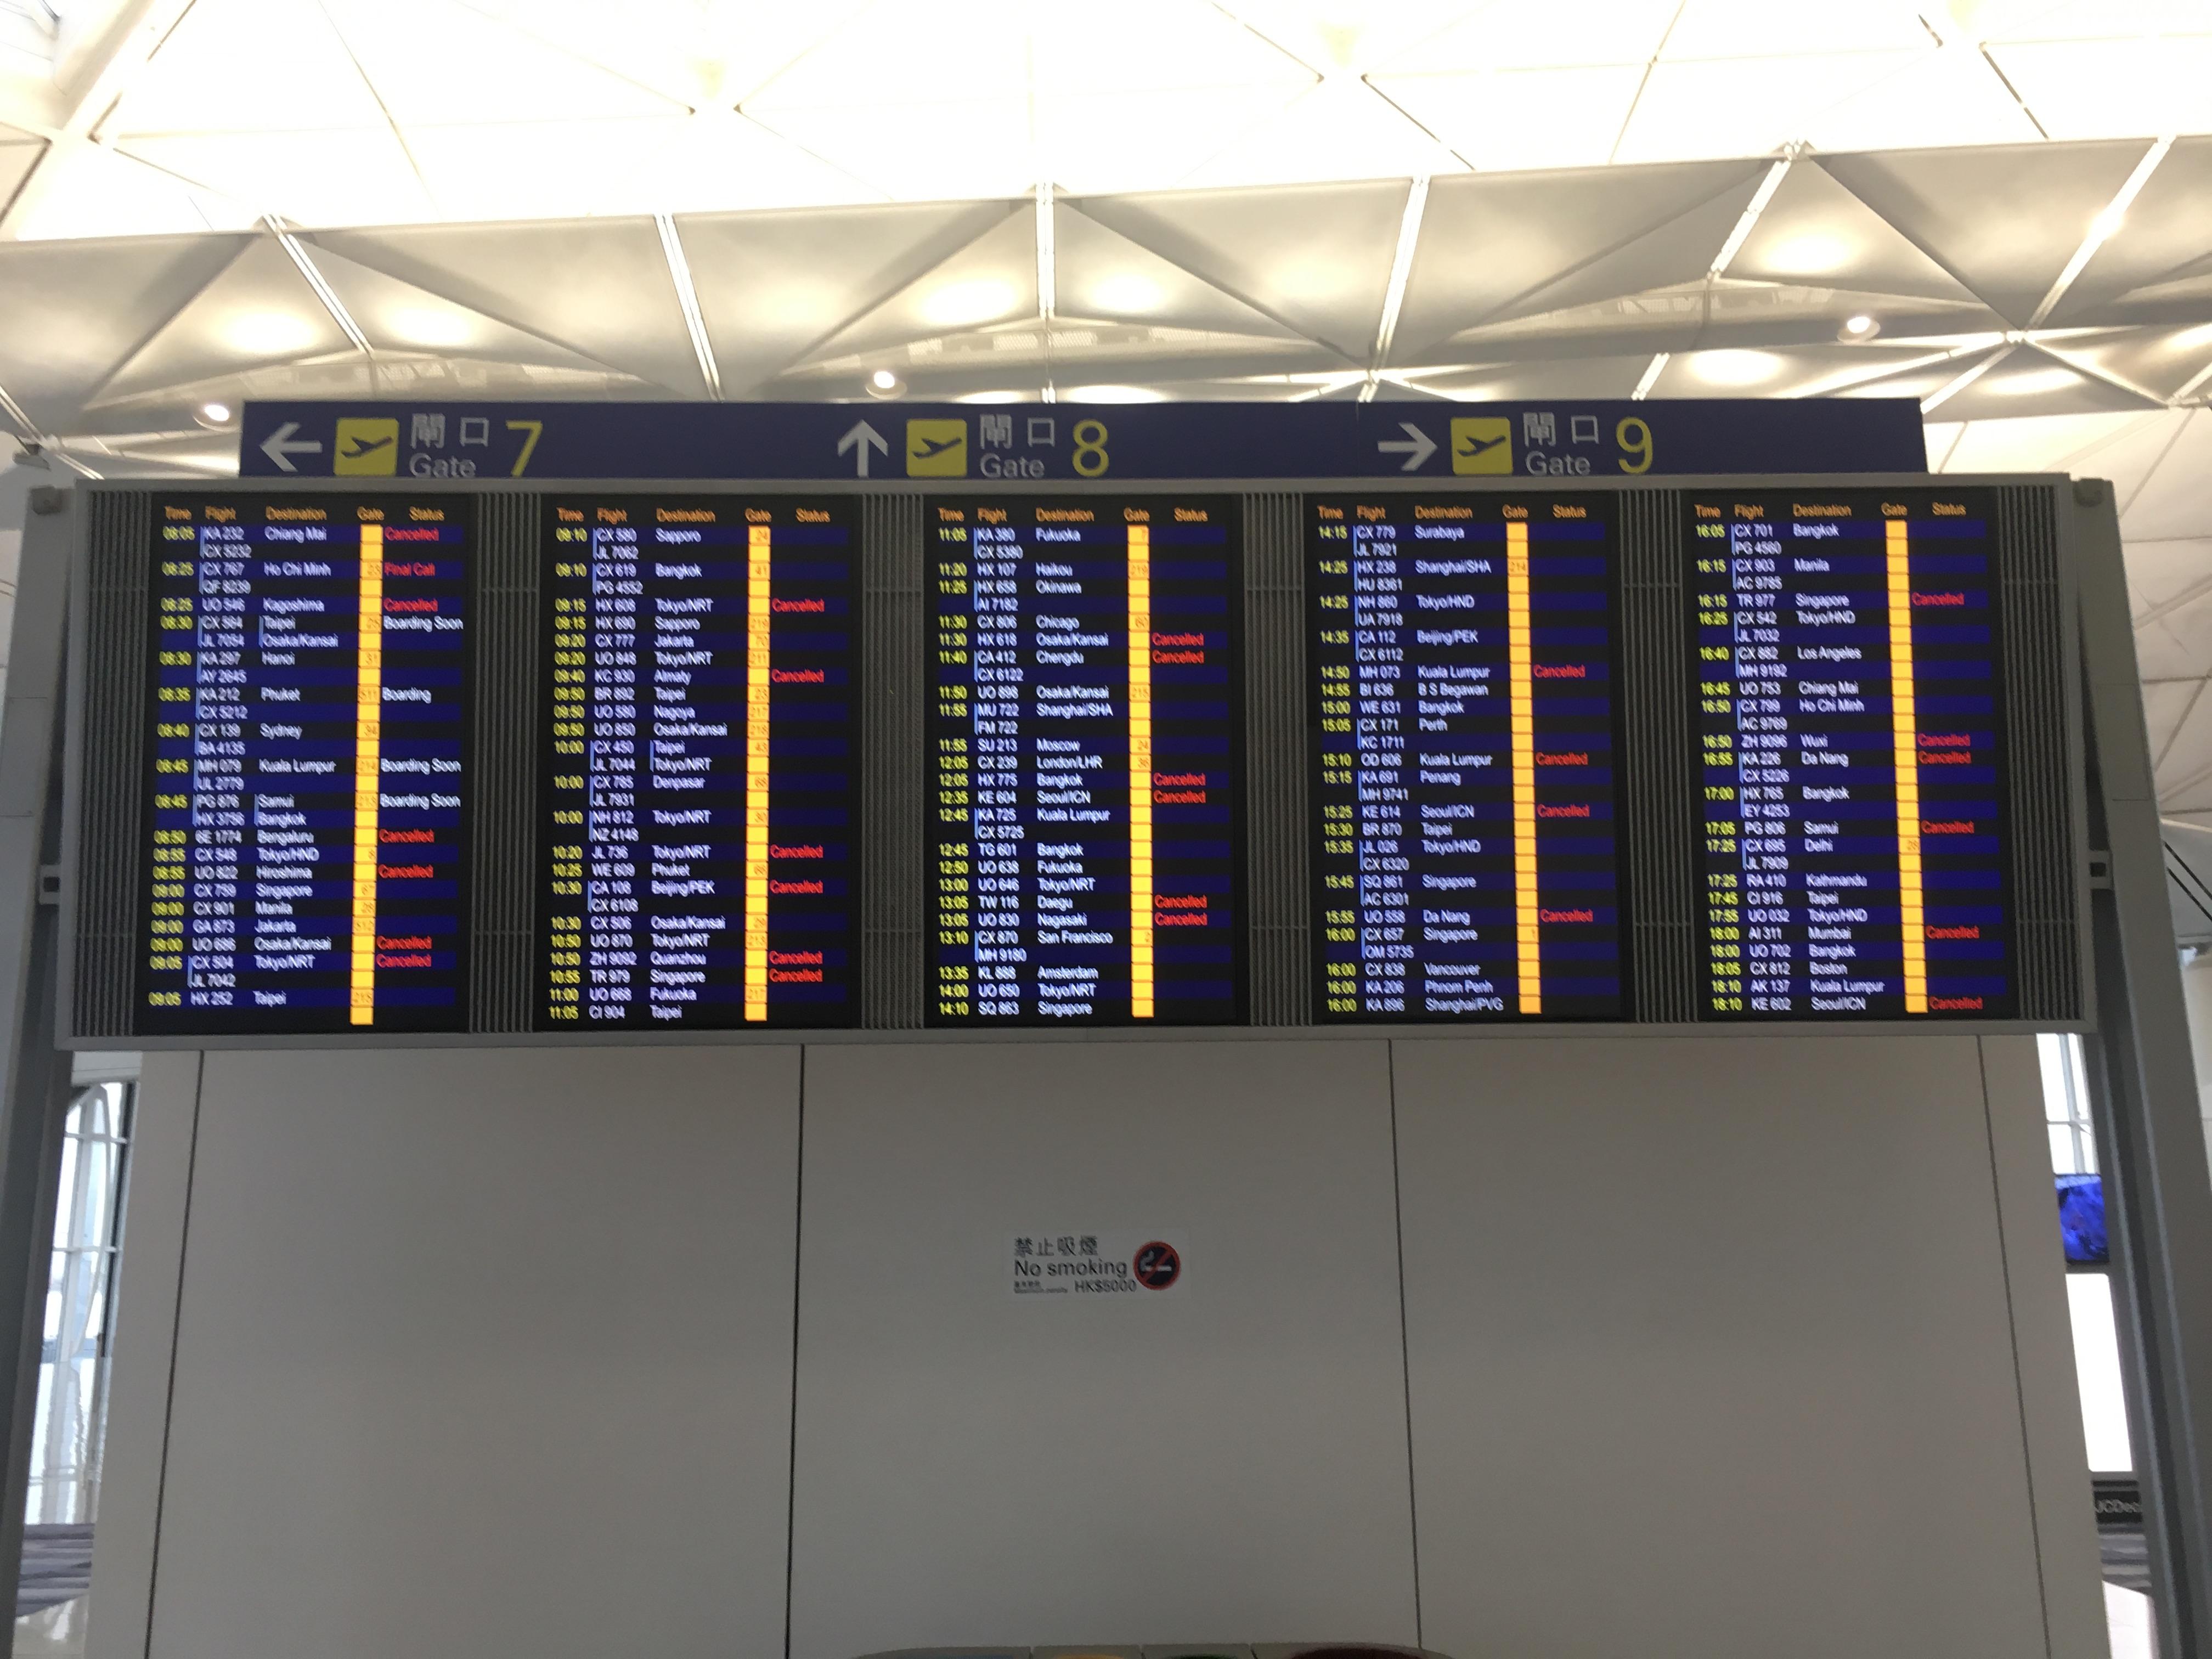 The flight departures board at Hong Kong airport, March 2020